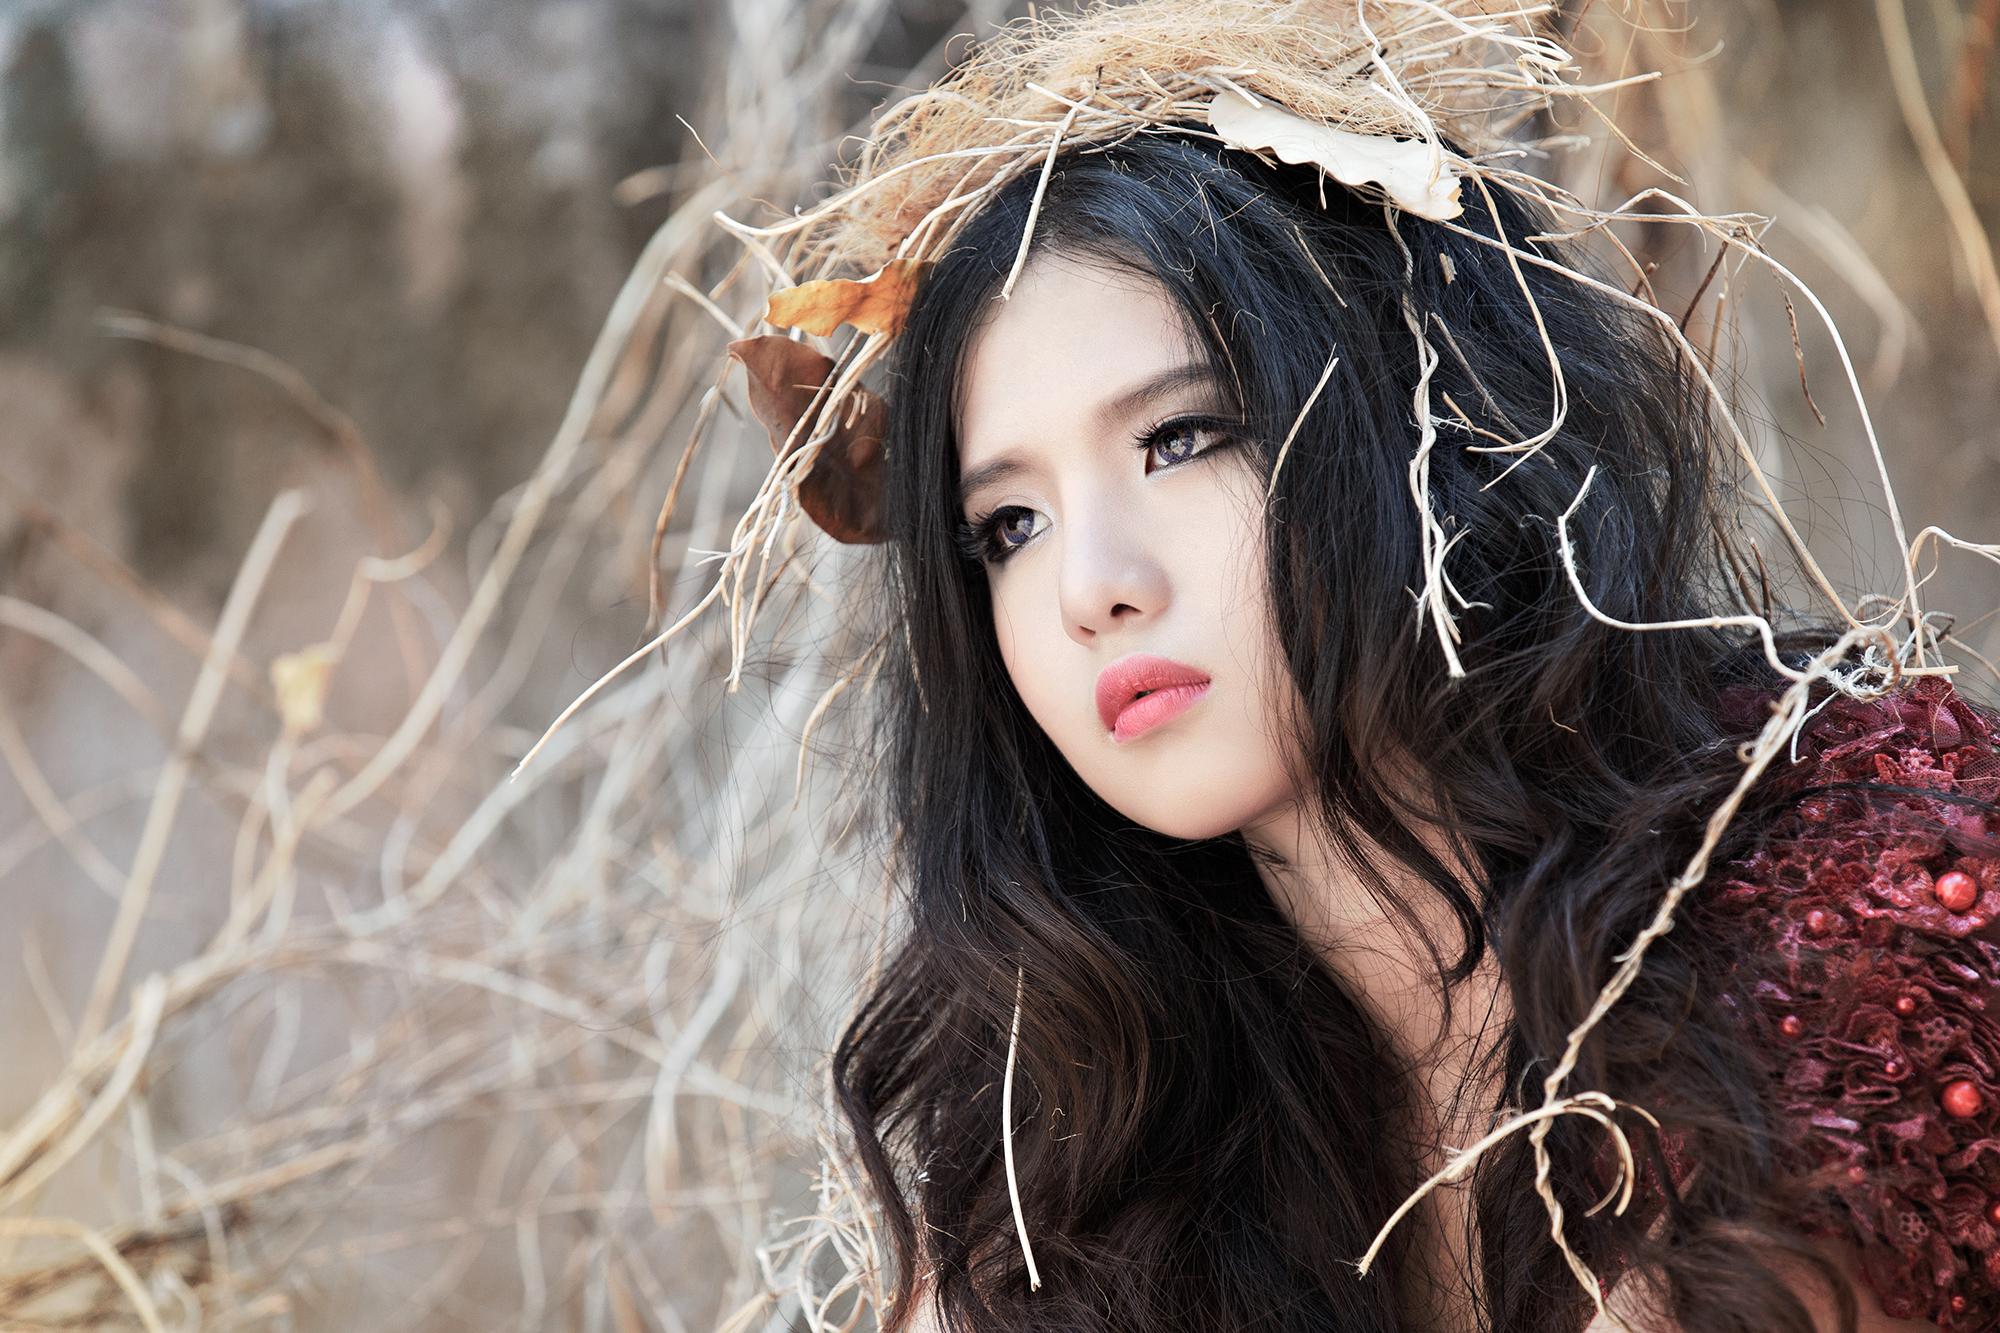 Cool Stylish Girl Hd Wallpaper Mitu Kat Hd Wallpaper Background Image 2000x1333 Id